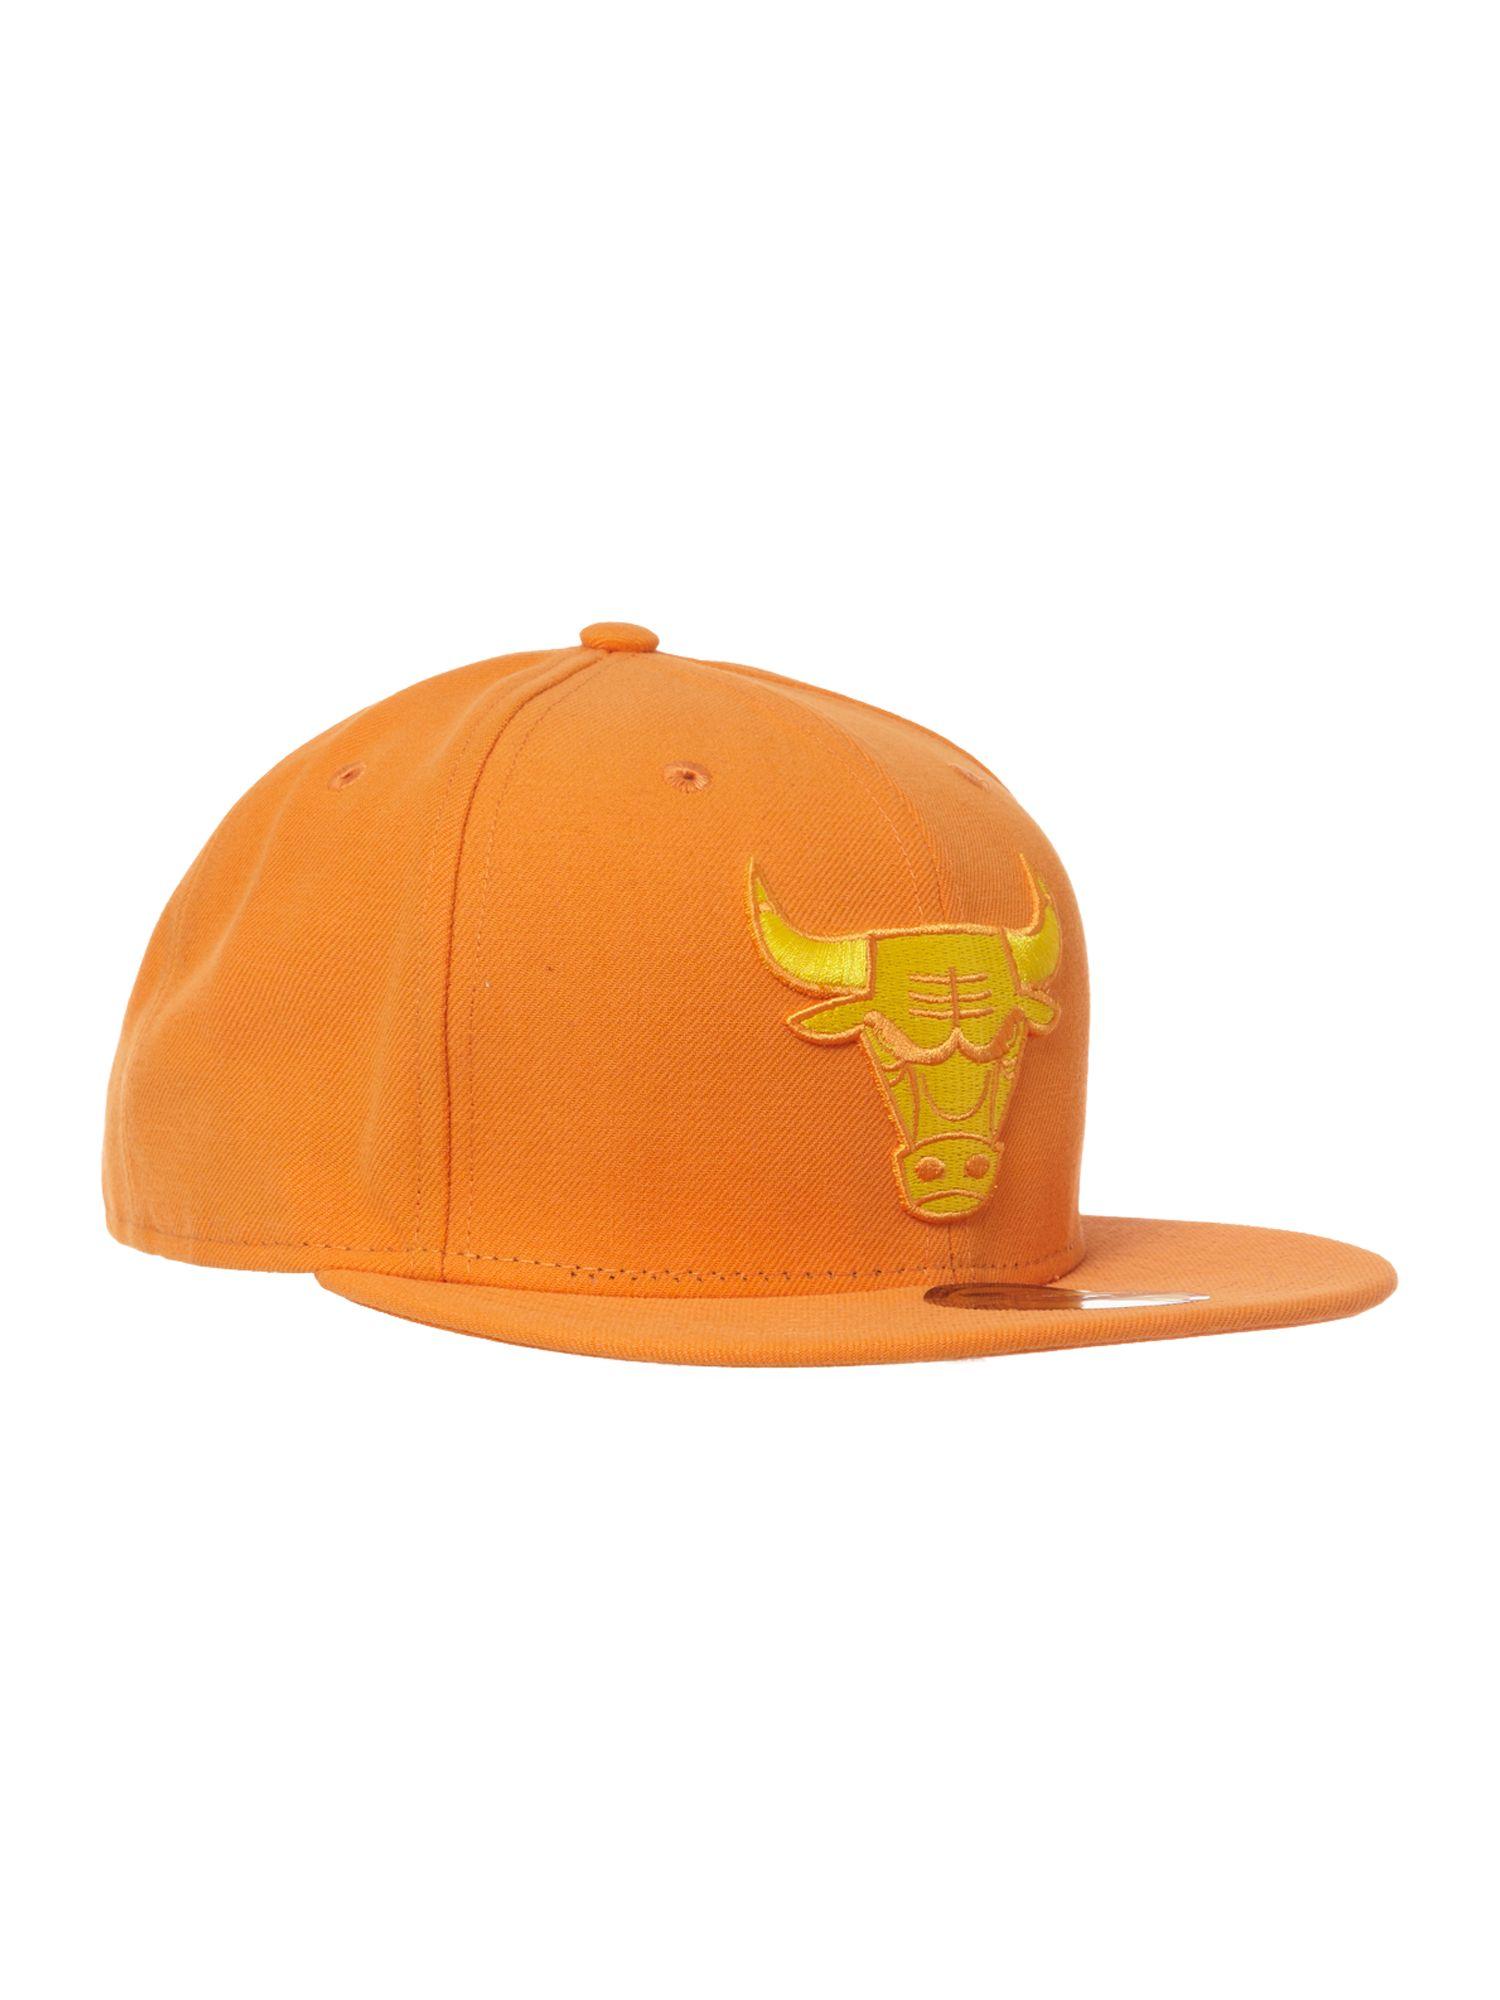 New Era Chicago Bulls 59 Fifty Baseball Cap In Orange For